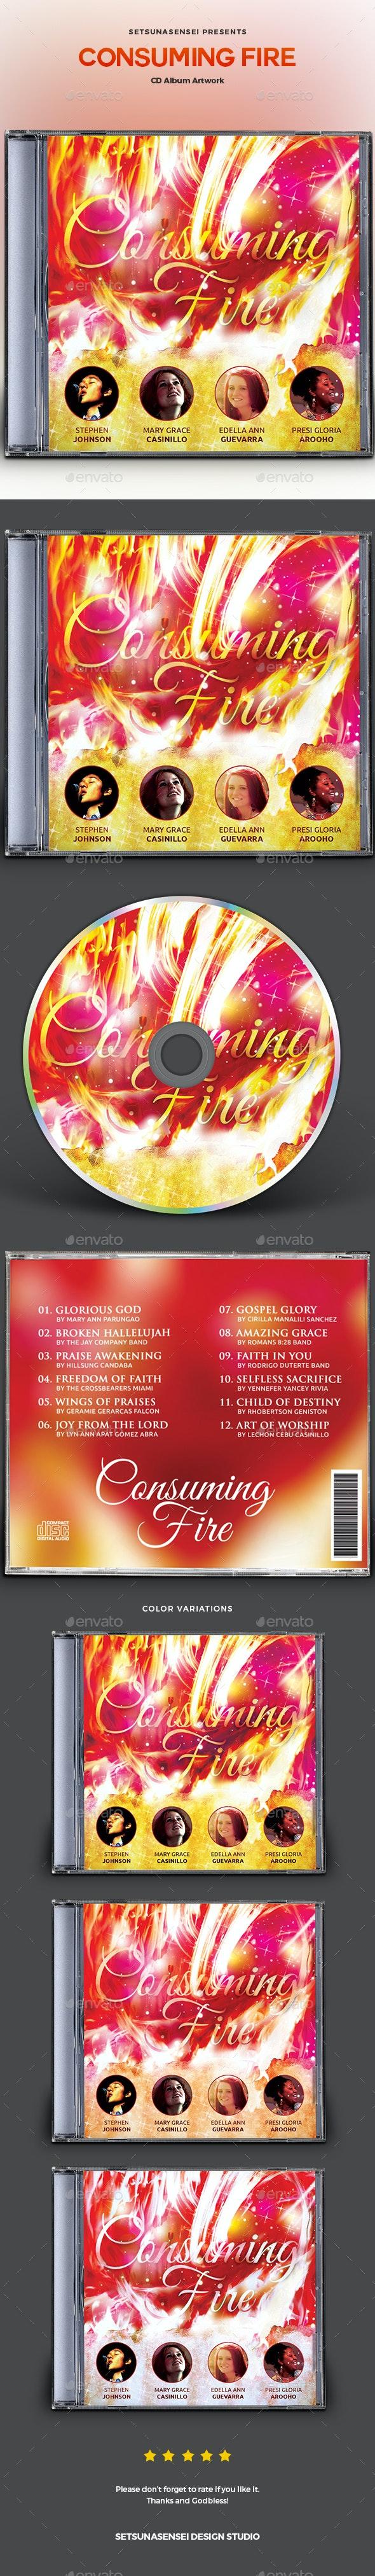 Consuming Fire CD Album Artwork - CD & DVD Artwork Print Templates